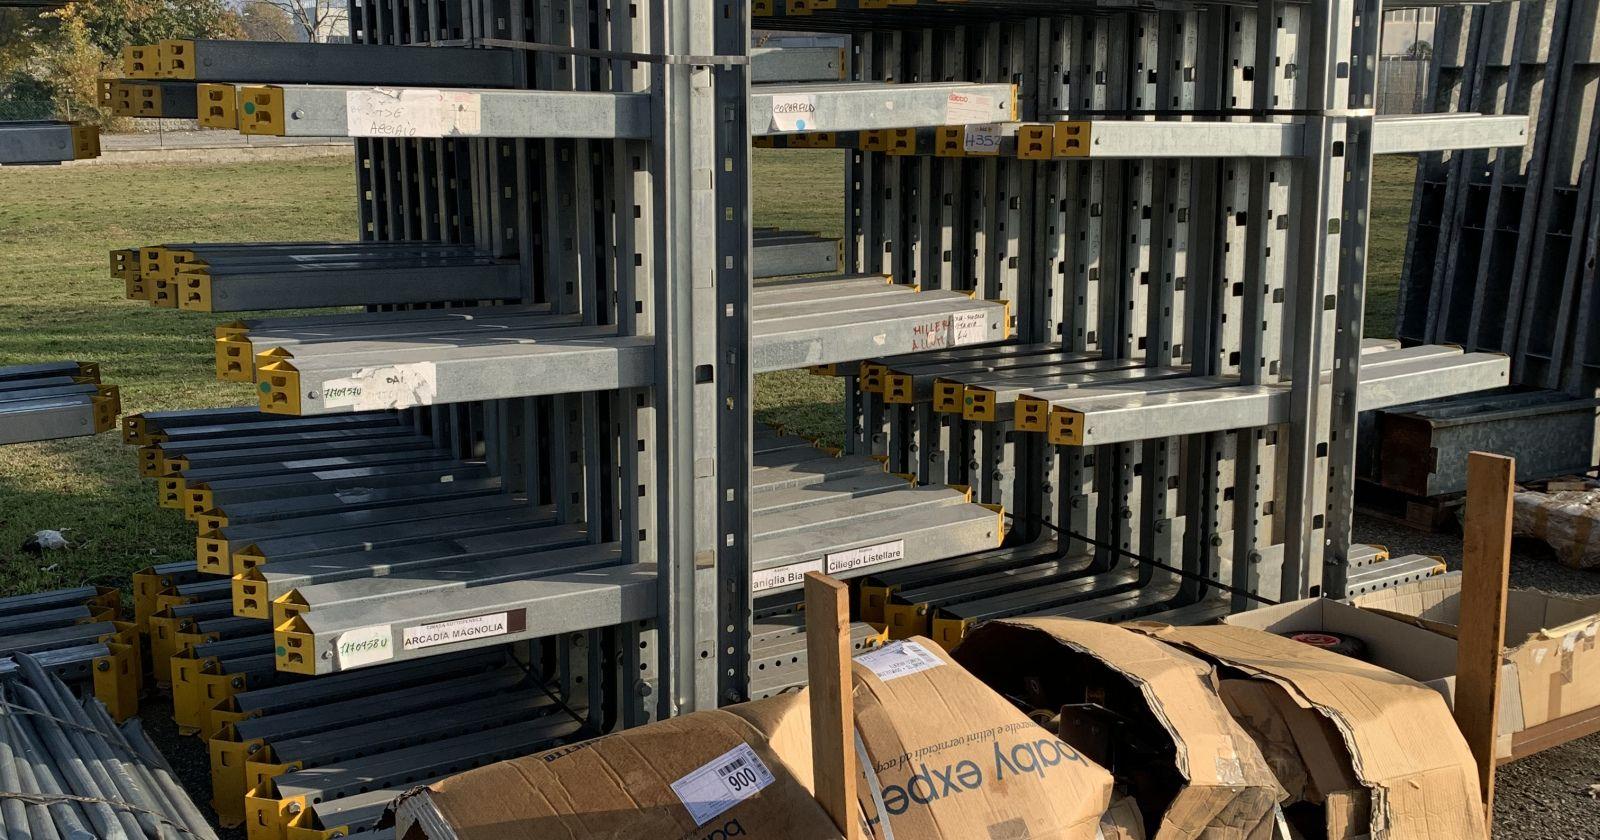 Scaffalatura Industriale Usata.Scaffalature Usate E Nuove Scaffalature Metalliche